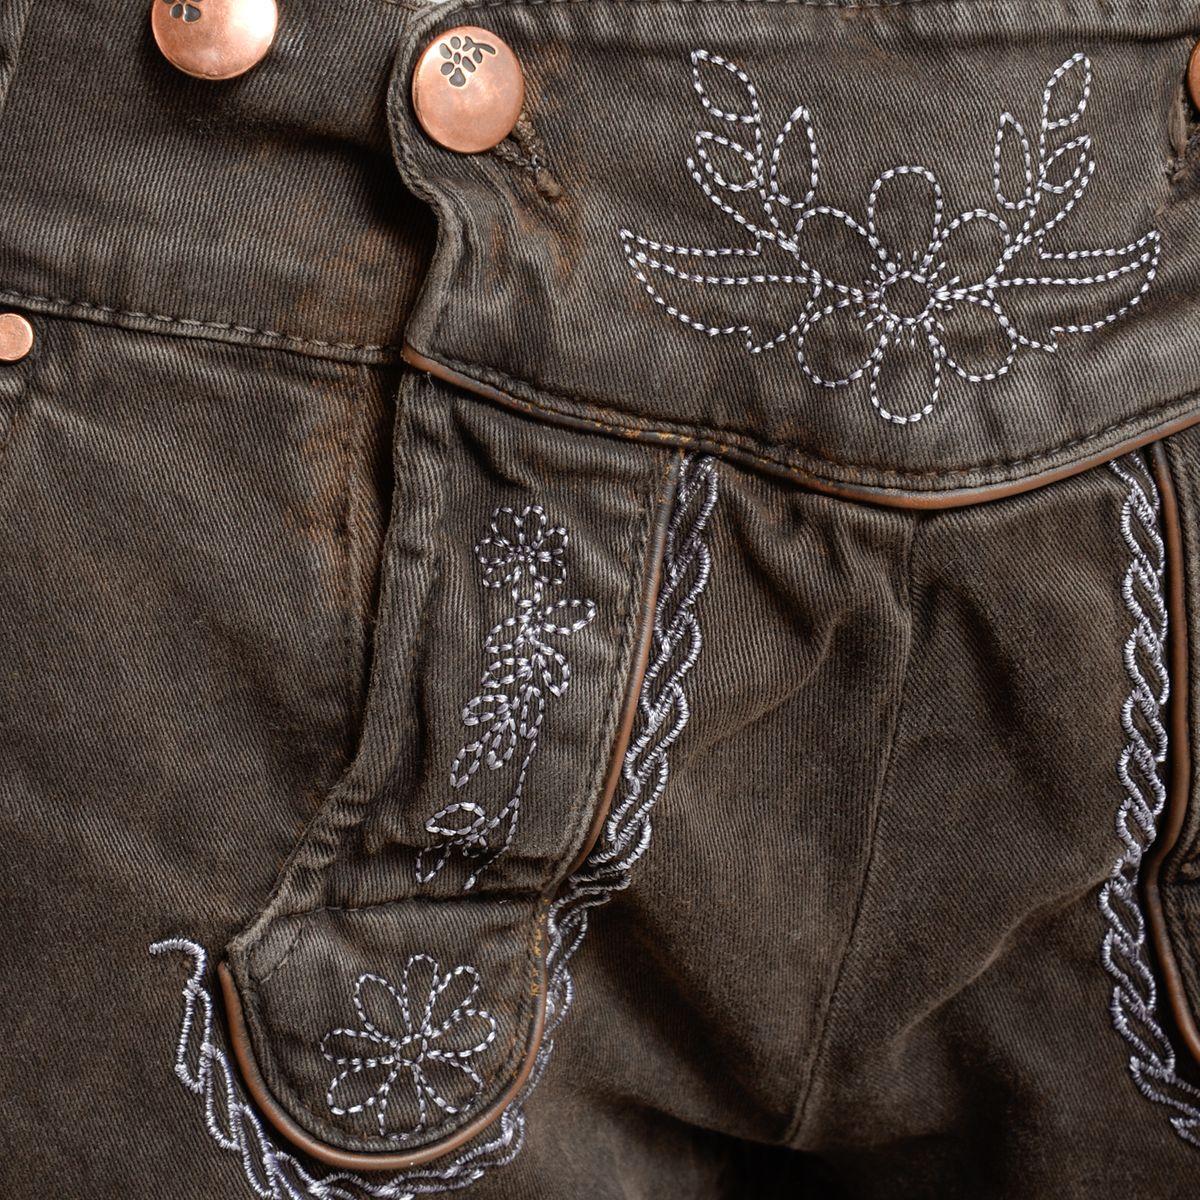 jeans lederhose bermuda in dunkelbraun von hangowear. Black Bedroom Furniture Sets. Home Design Ideas